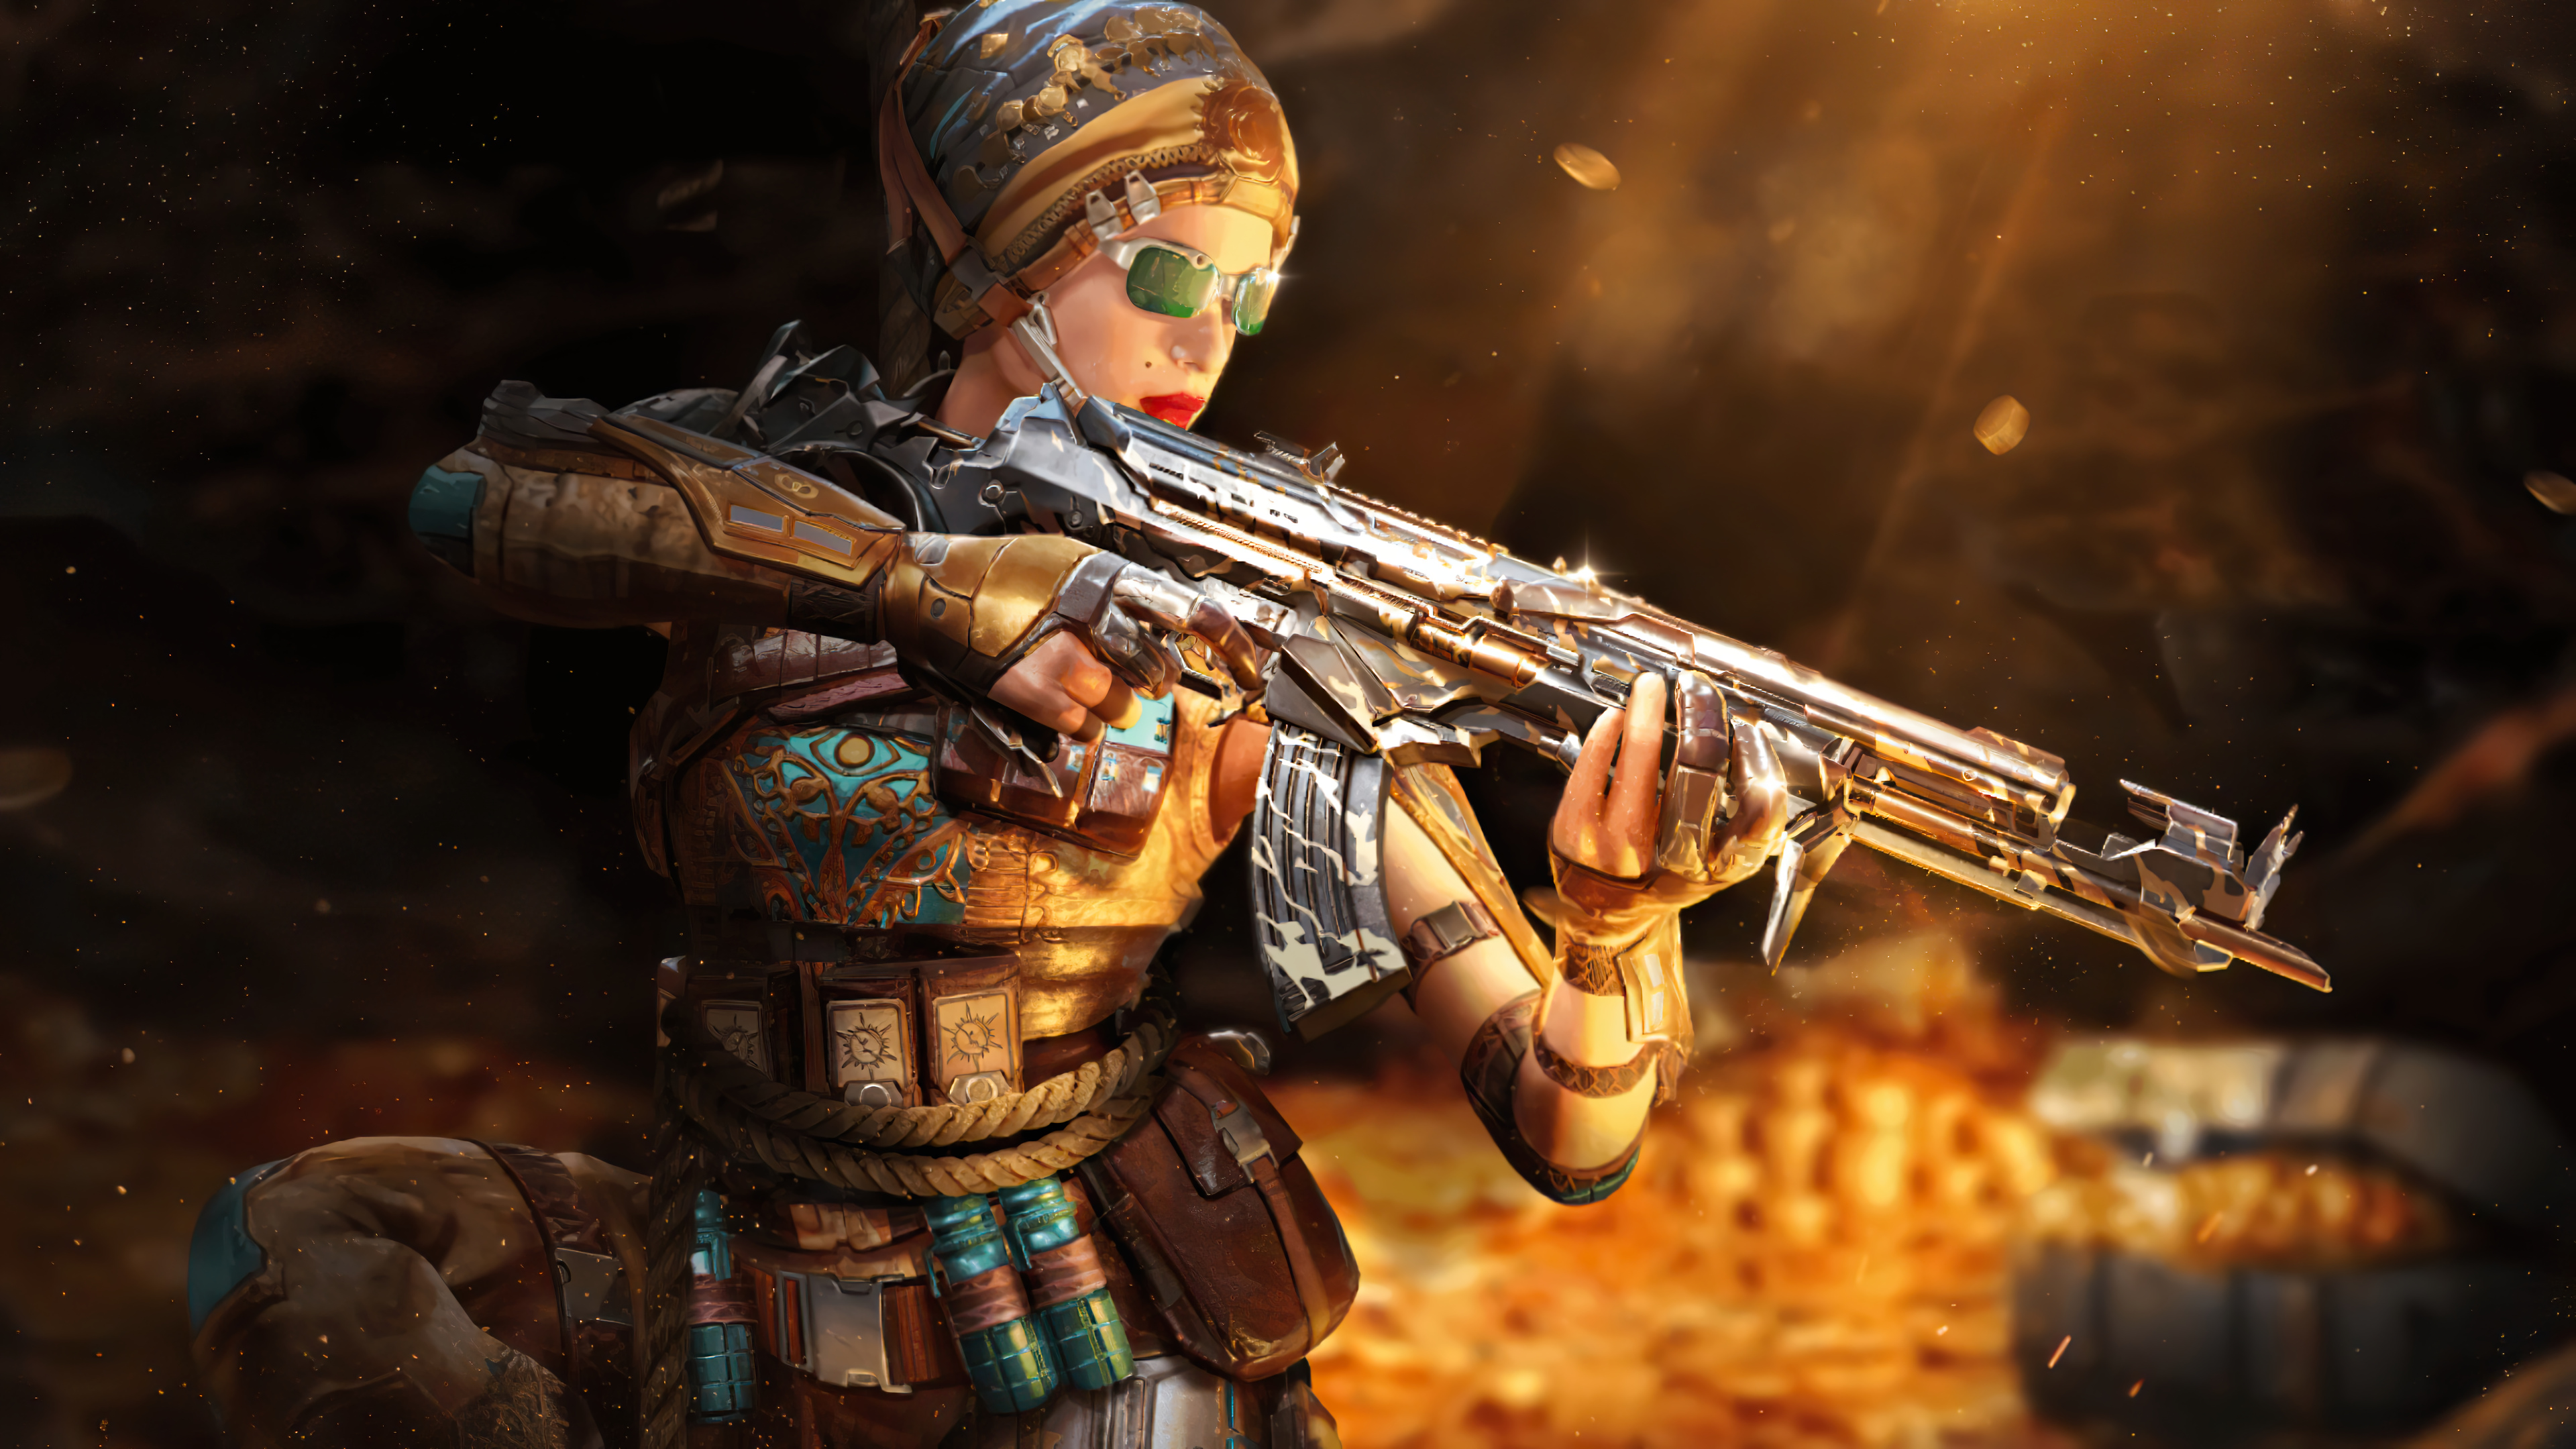 Fondos de pantalla Call of Duty Mobile Outrider Mystic Skin